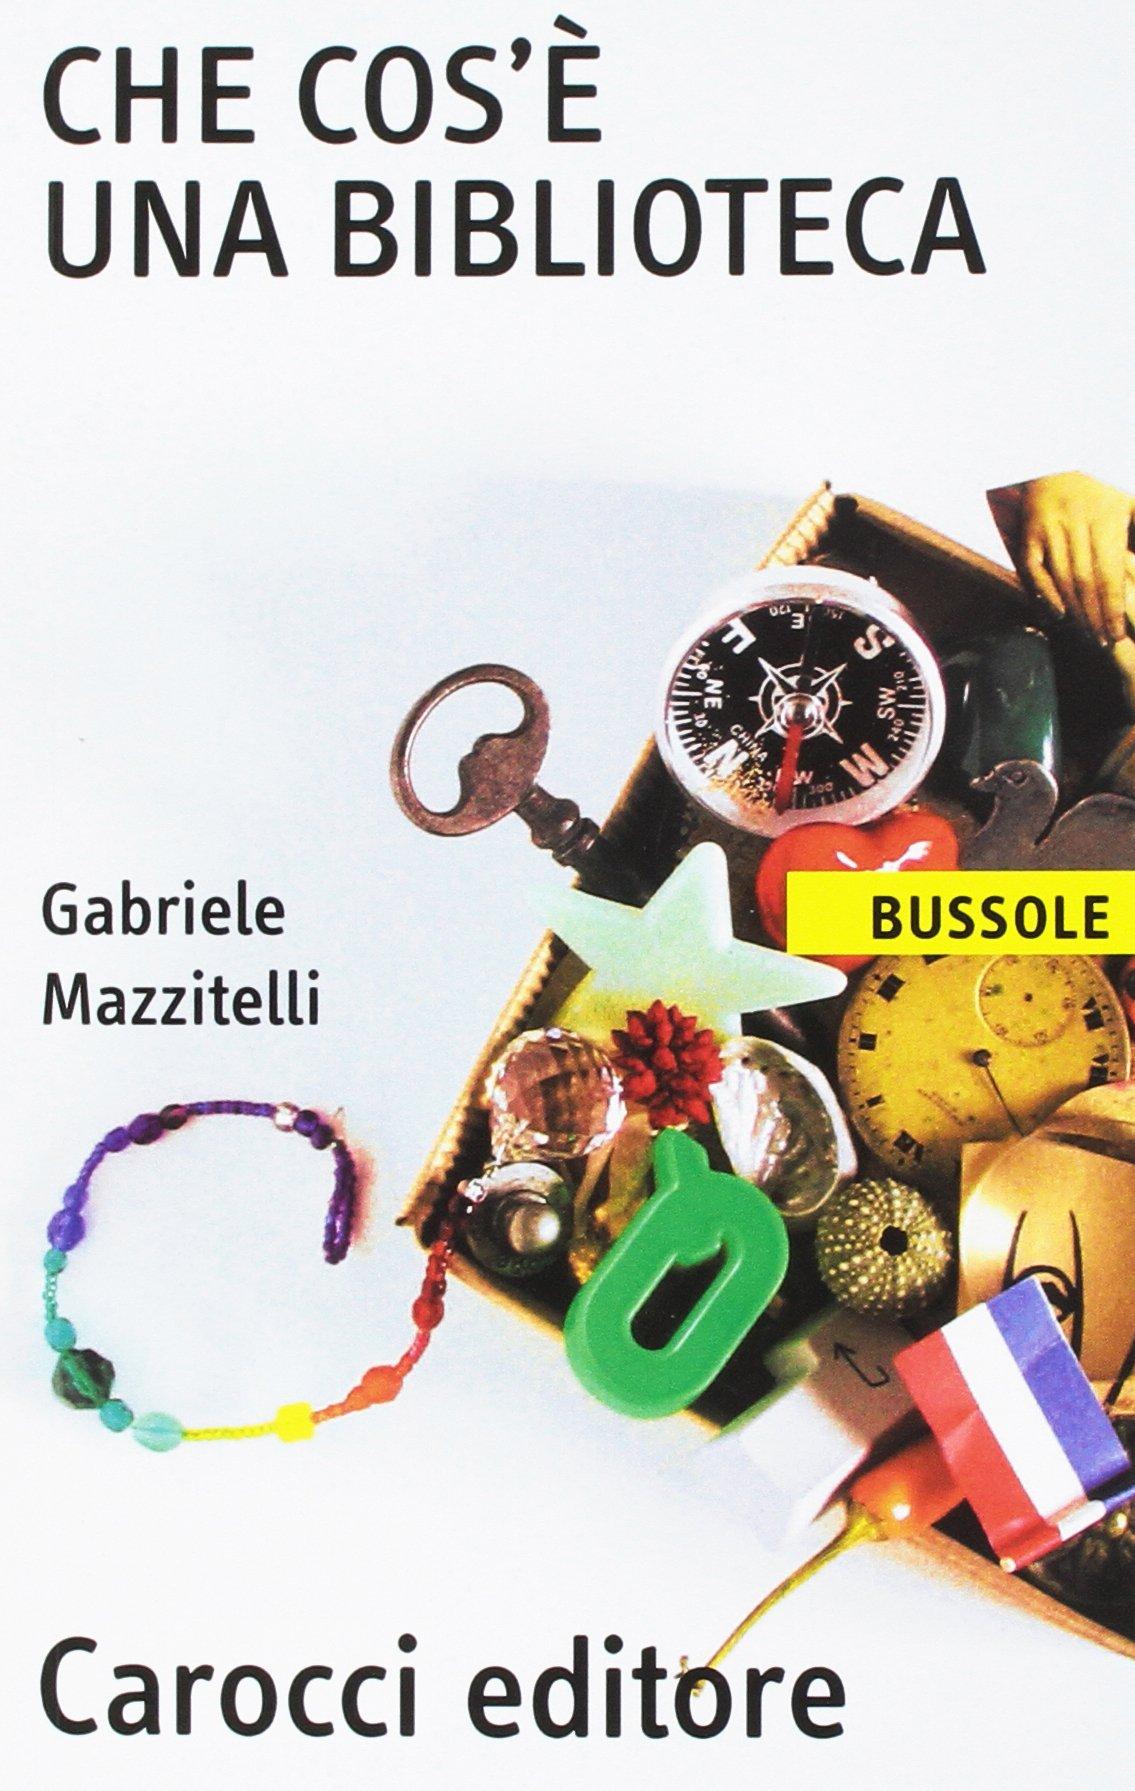 Che cos'è una biblioteca Copertina flessibile – 14 lug 2005 Gabriele Mazzitelli Che cos' è una biblioteca Carocci 8843033220